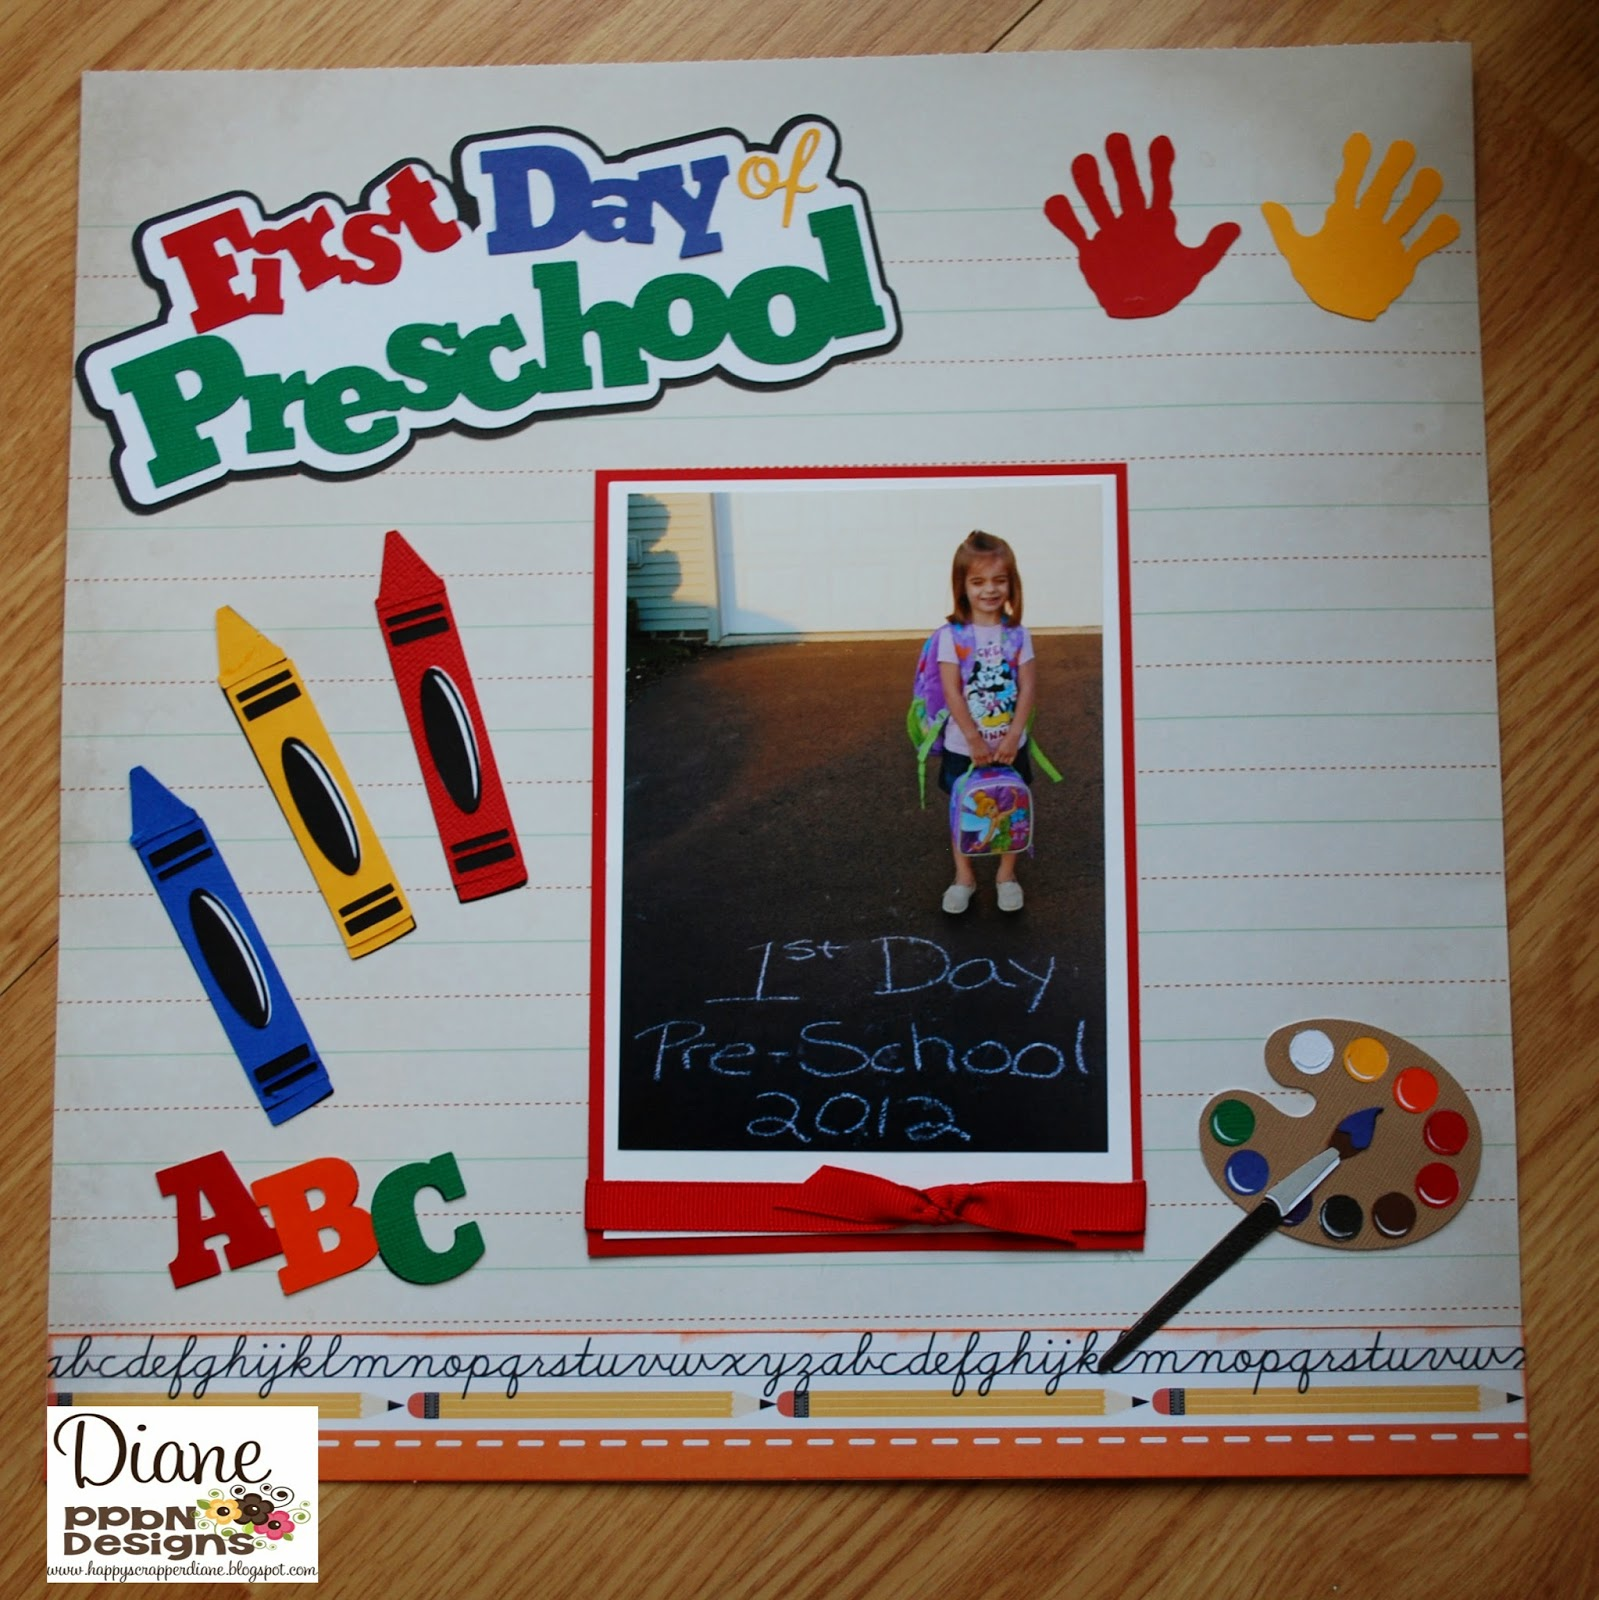 Ppbn Designs Blog First Day Of Preschool